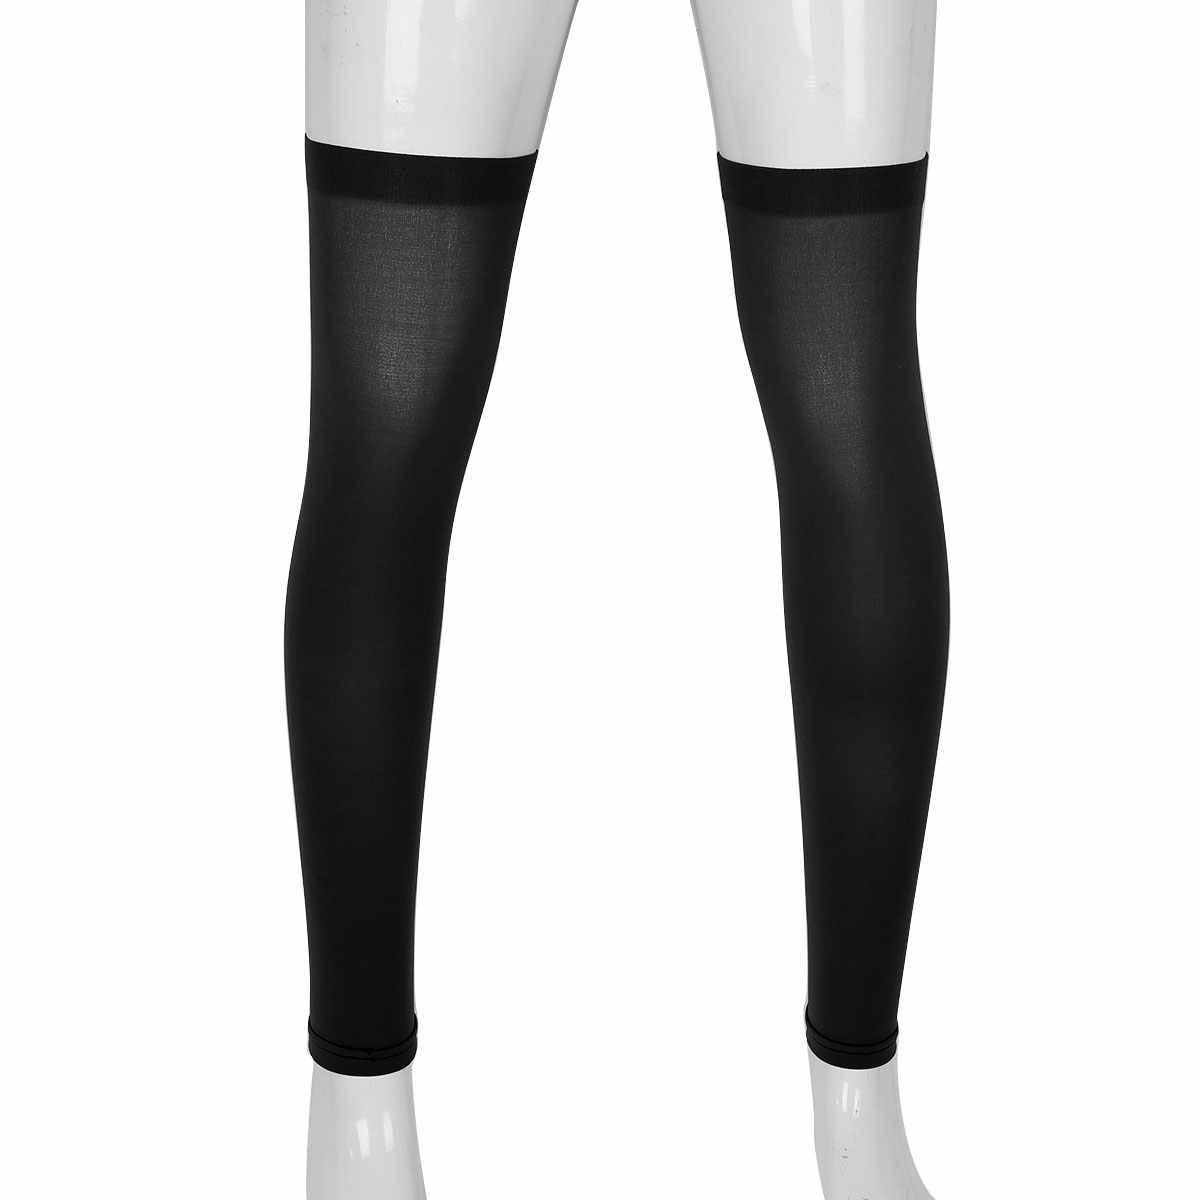 YOOJIA الرجال الحرير عالية رقيقة تنفس فستان البدلة الجوارب كامل الساق كم دعامة الركبة القدم الرياضة الجوارب الطويلة رجل بسط الجورب